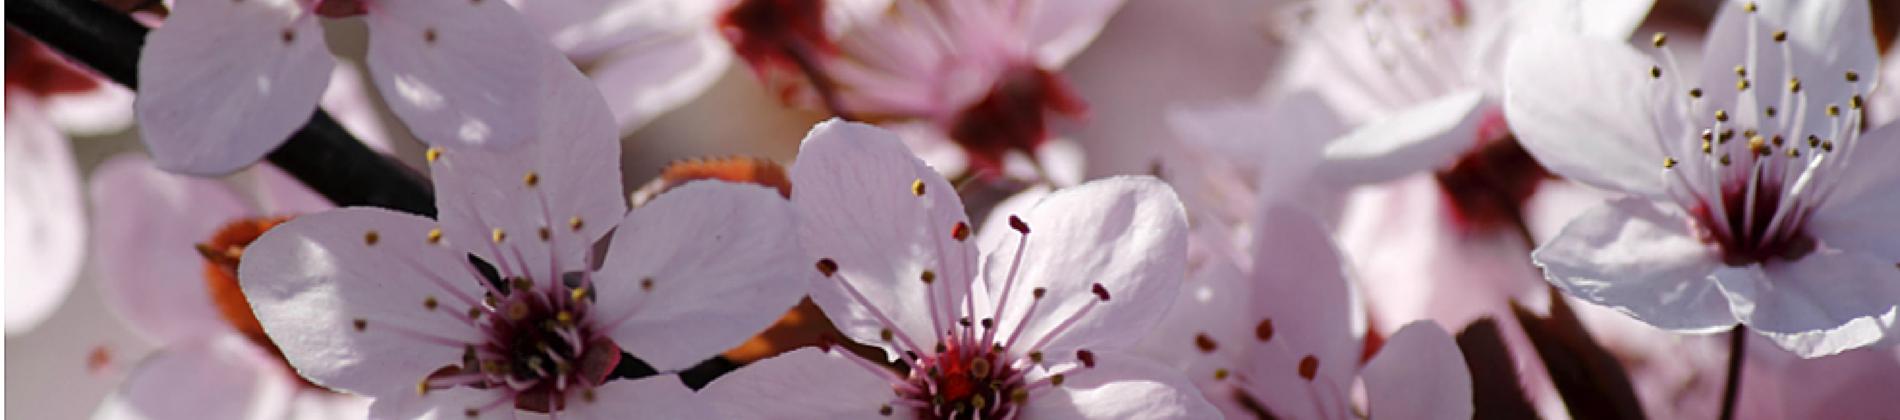 flowers header